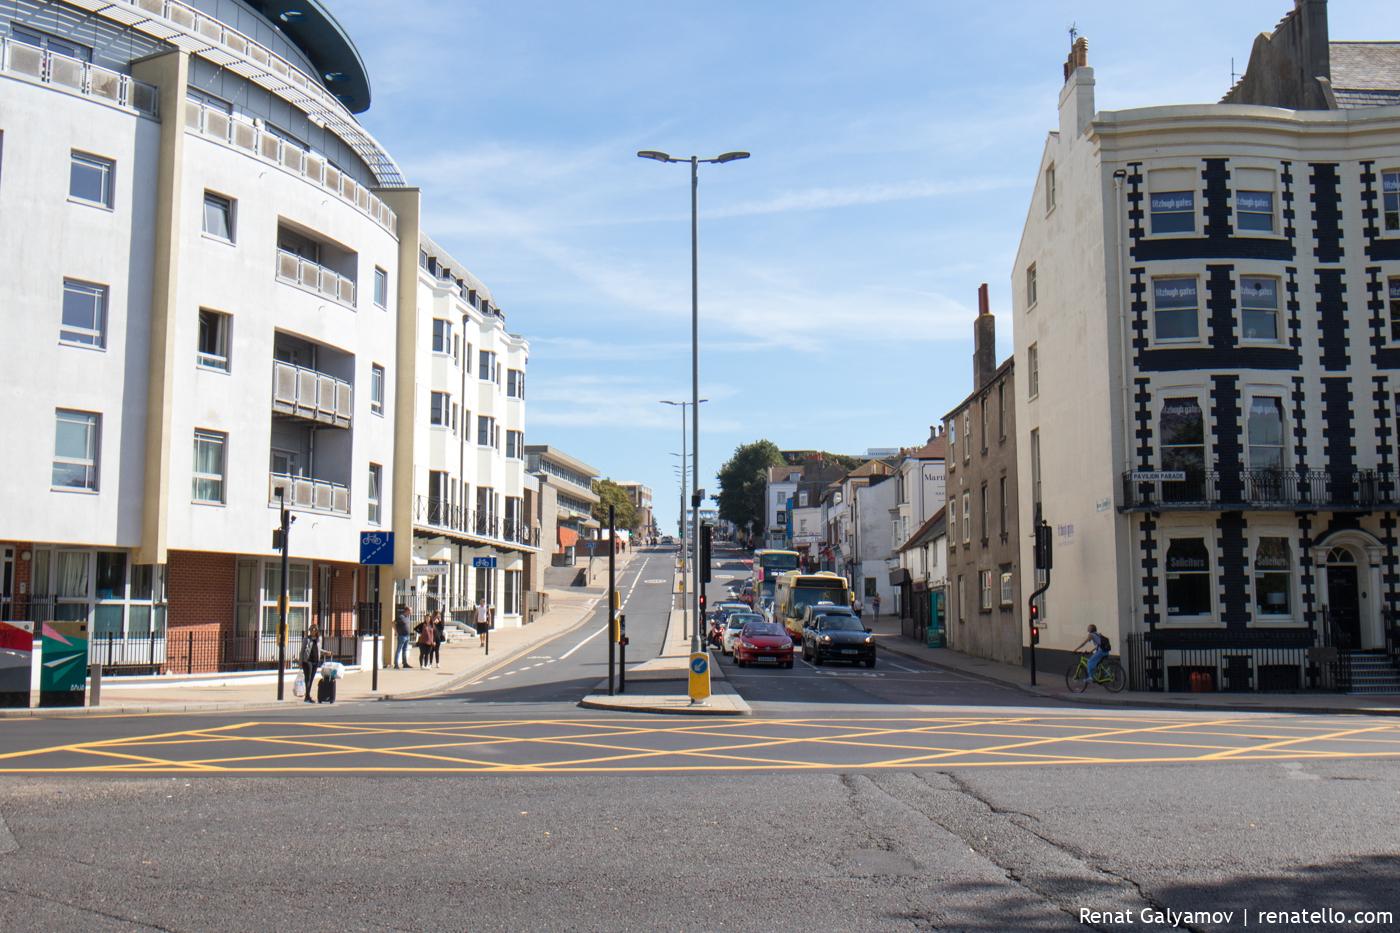 Brighton hills